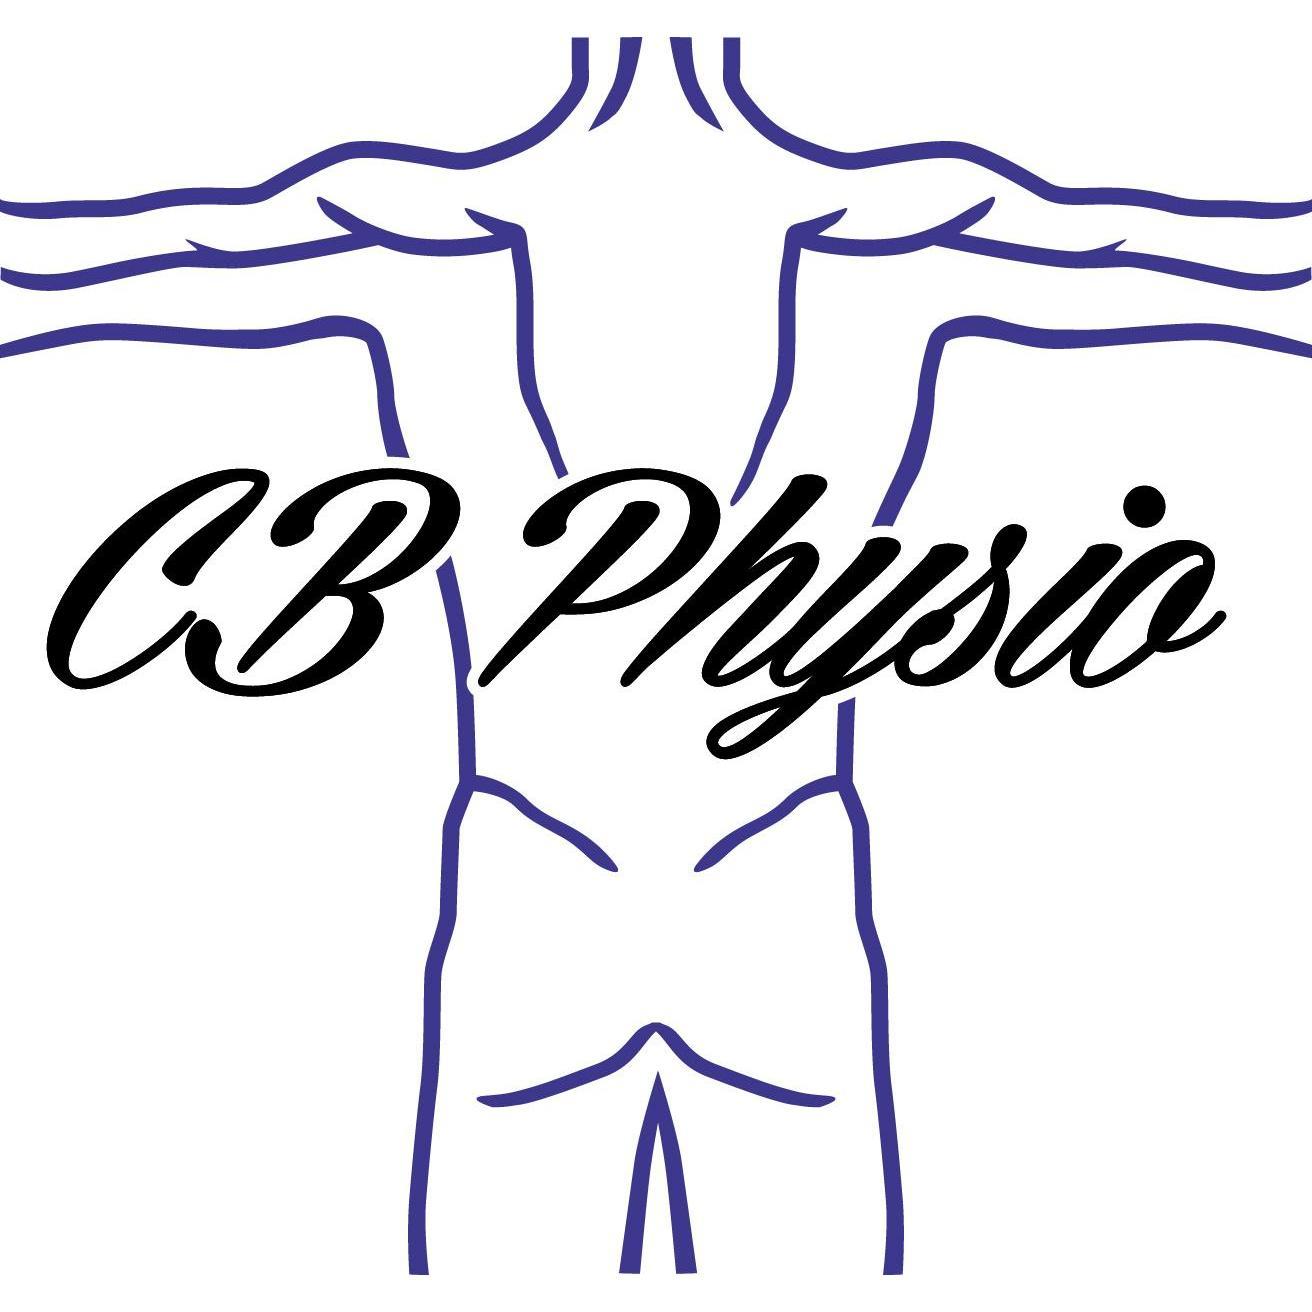 Cb Physio